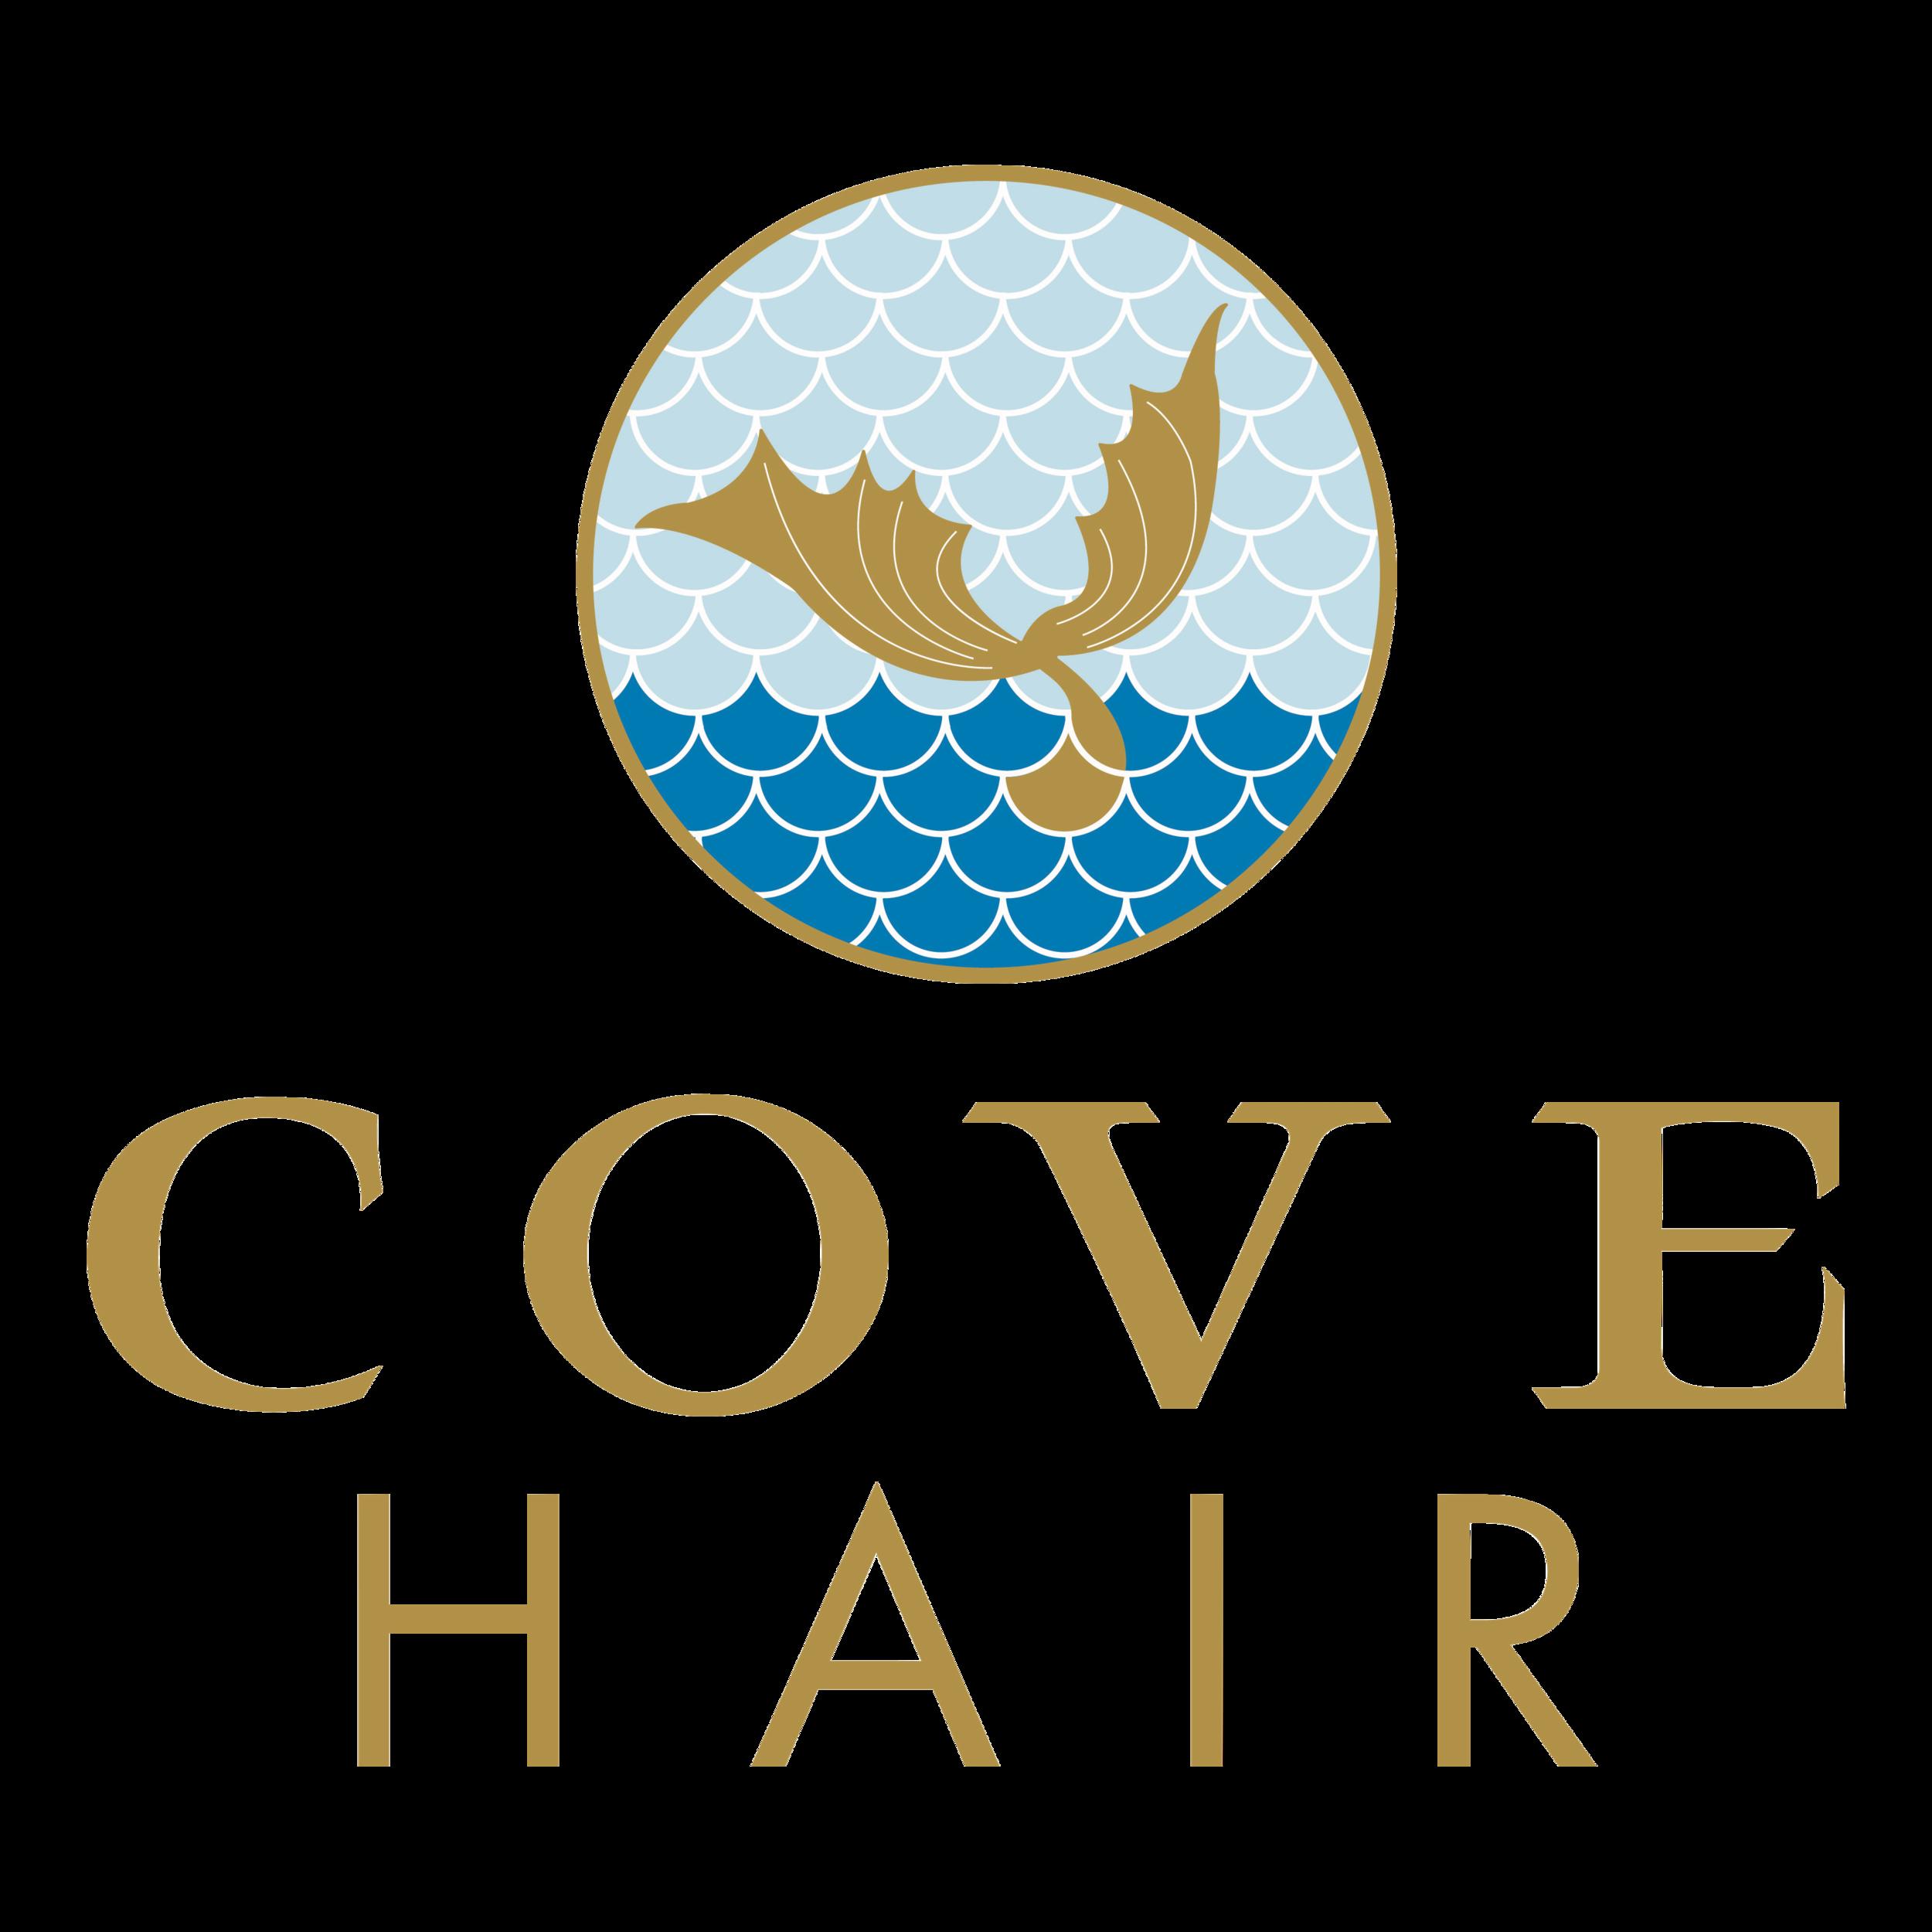 Cove FINAL.png